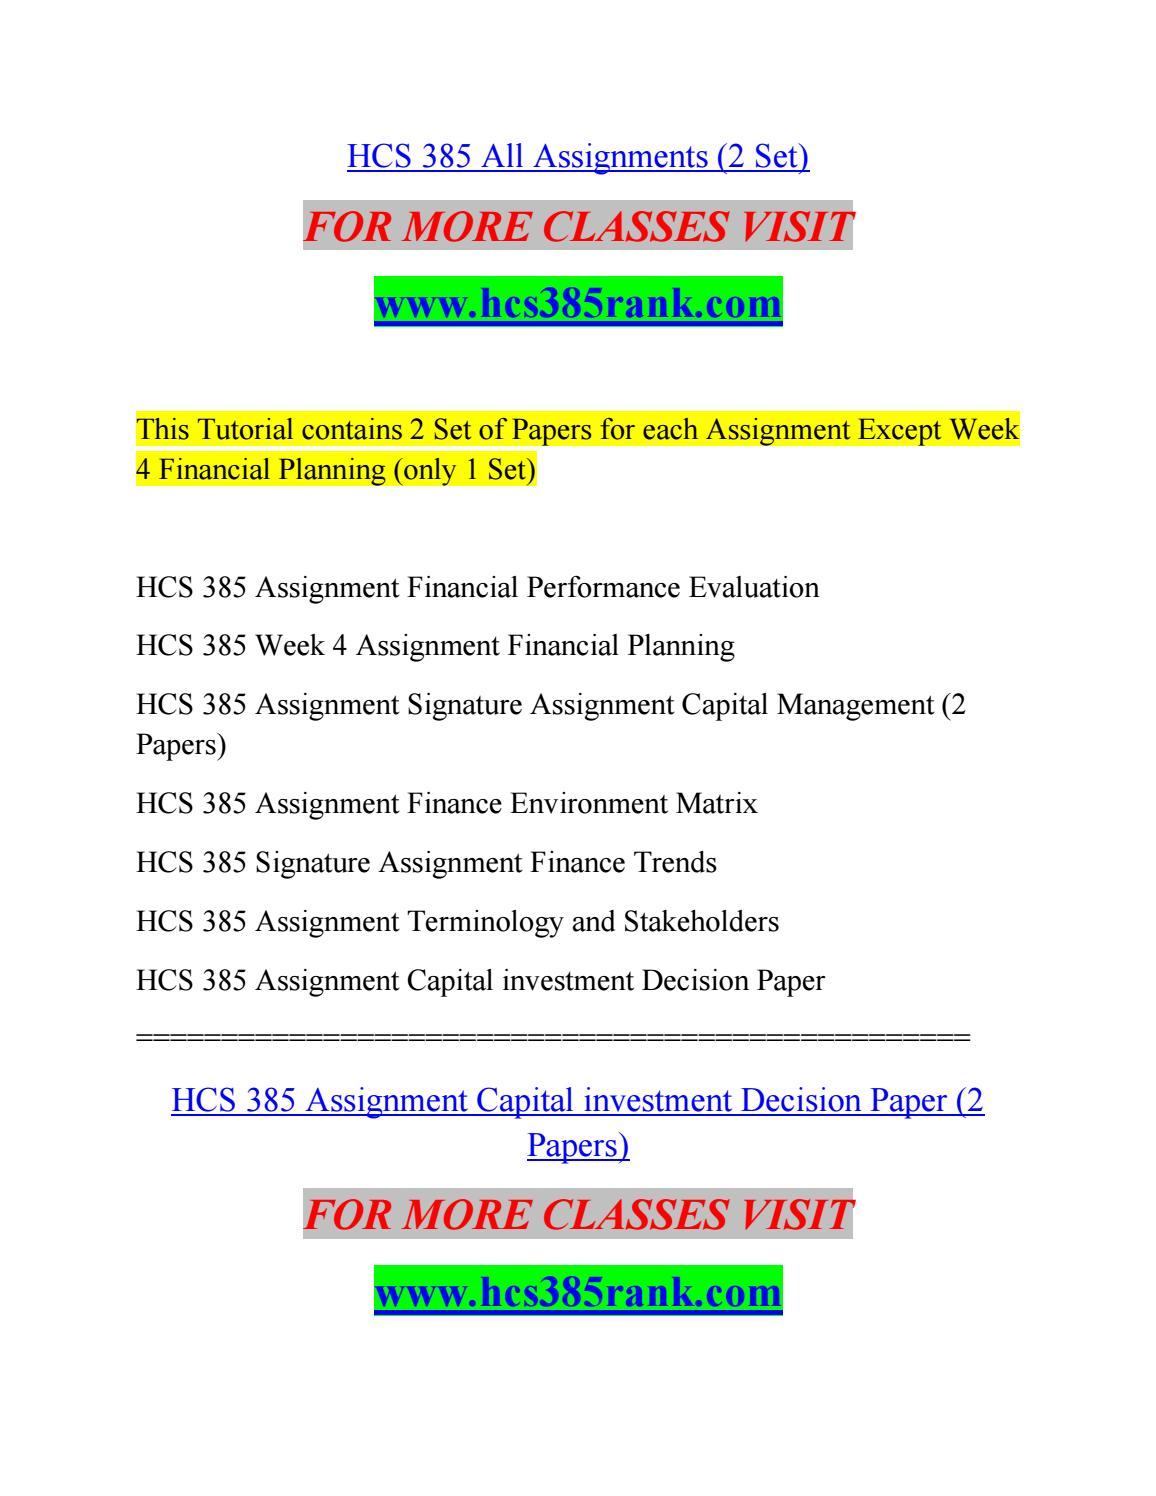 Ratioysis Spreadsheet Hcs 385 Pertaining To Hcs 385